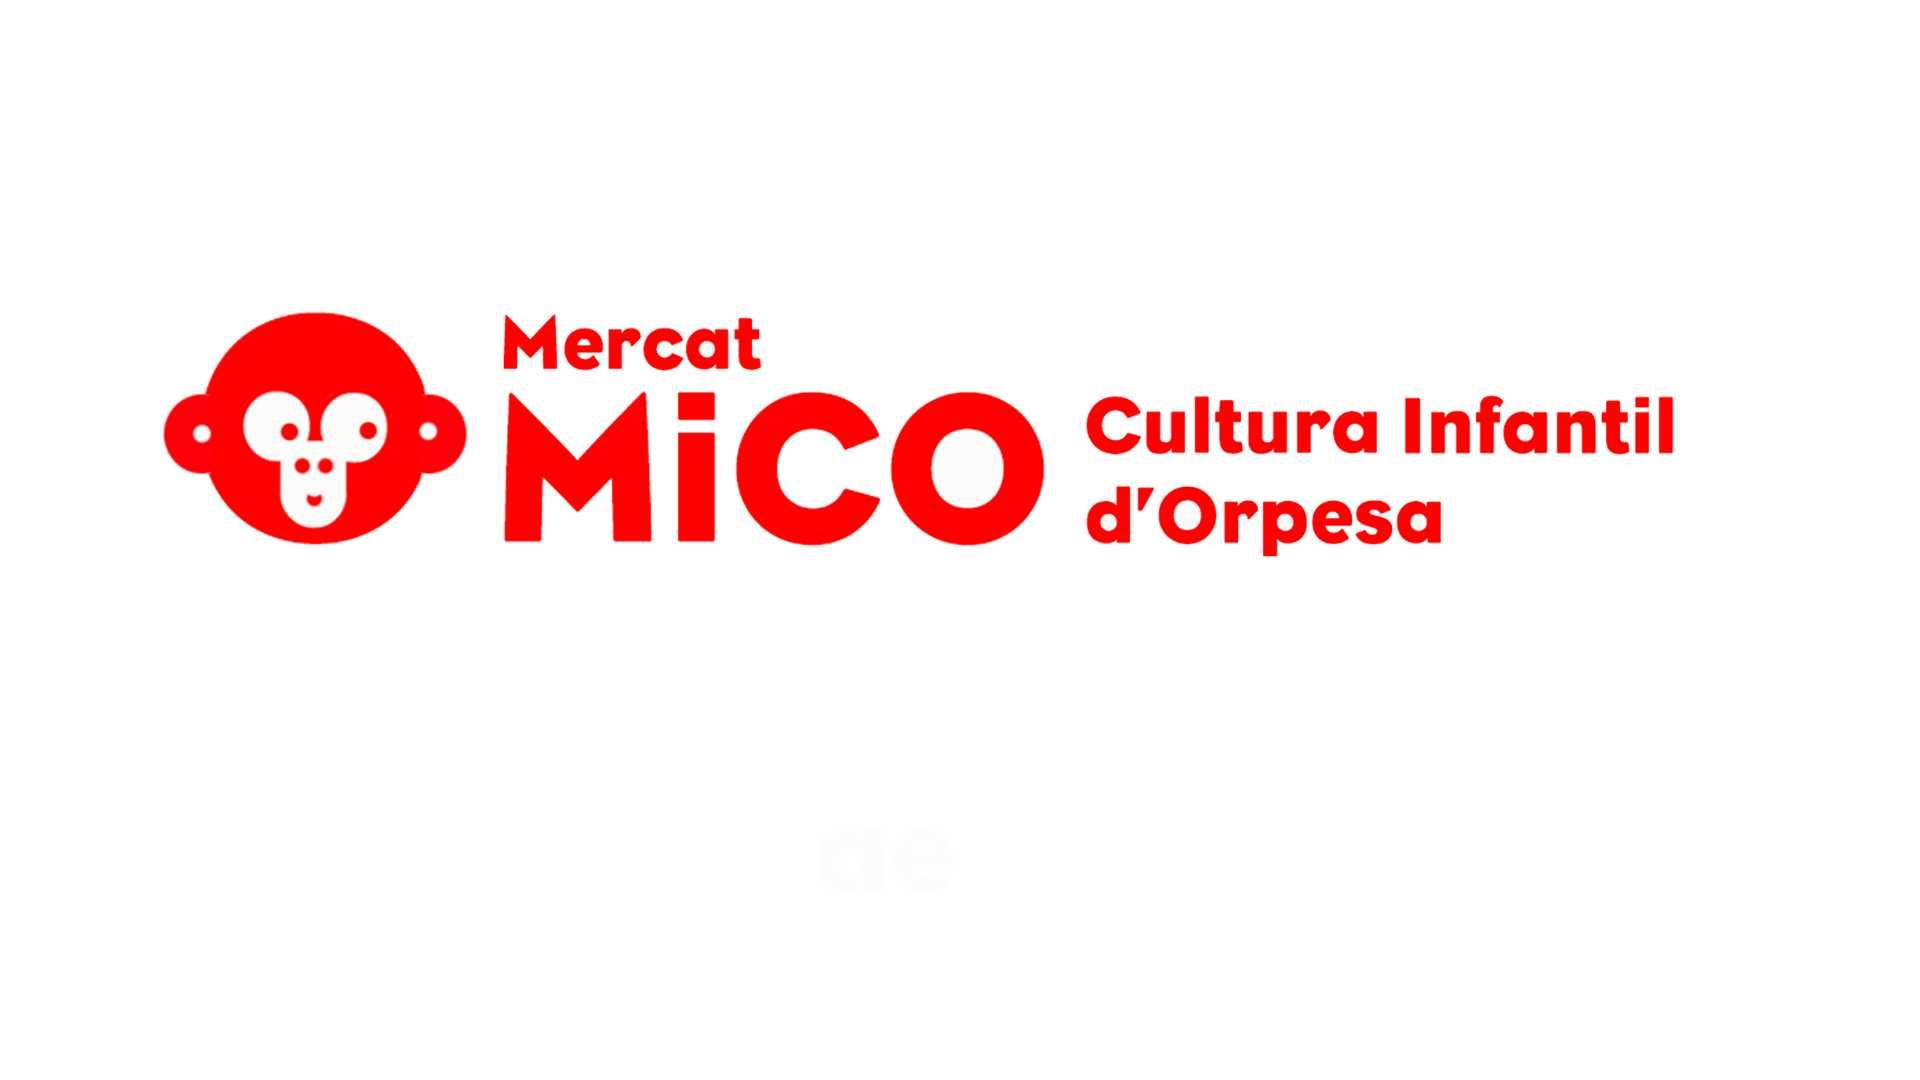 Mercat MICO